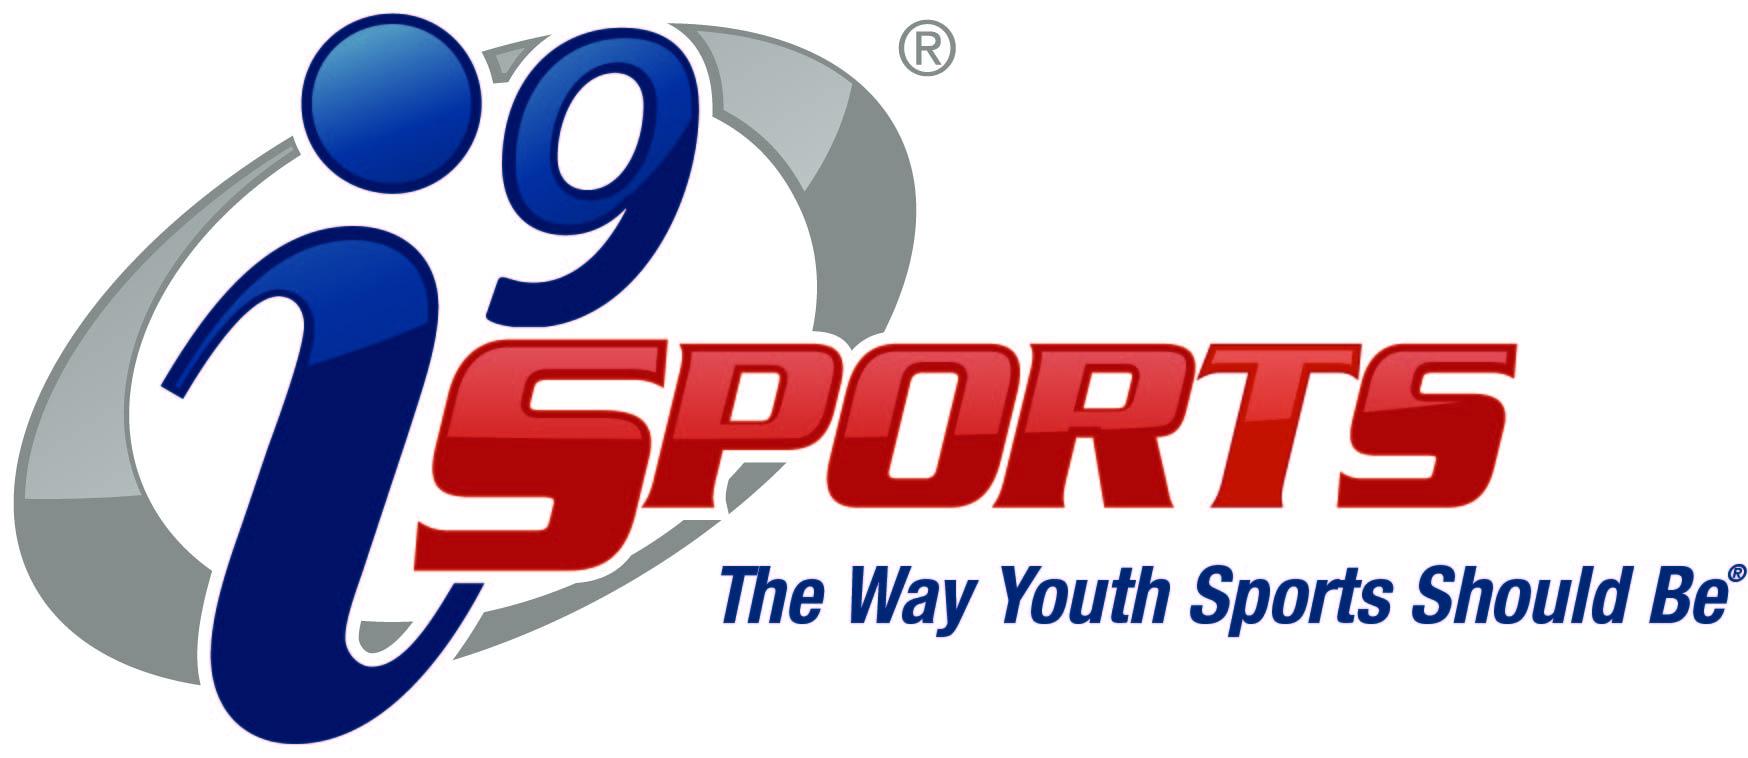 Metallic i9 Sports logo 3D with tagline.jpg